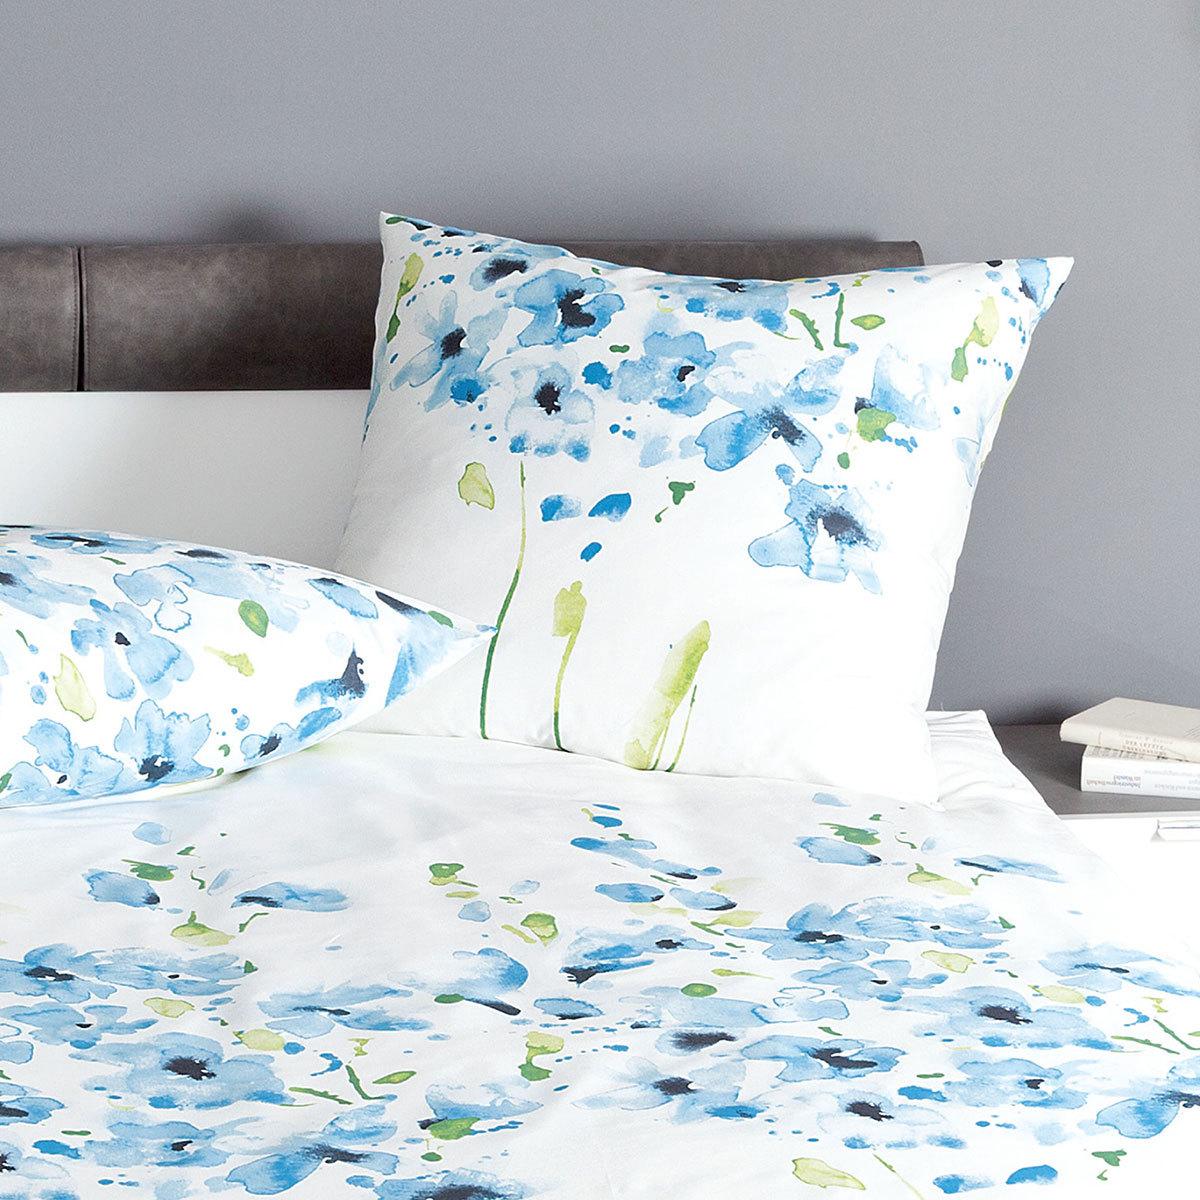 janine mako satin bettw sche moments 98014 02 g nstig online kaufen bei bettwaren shop. Black Bedroom Furniture Sets. Home Design Ideas